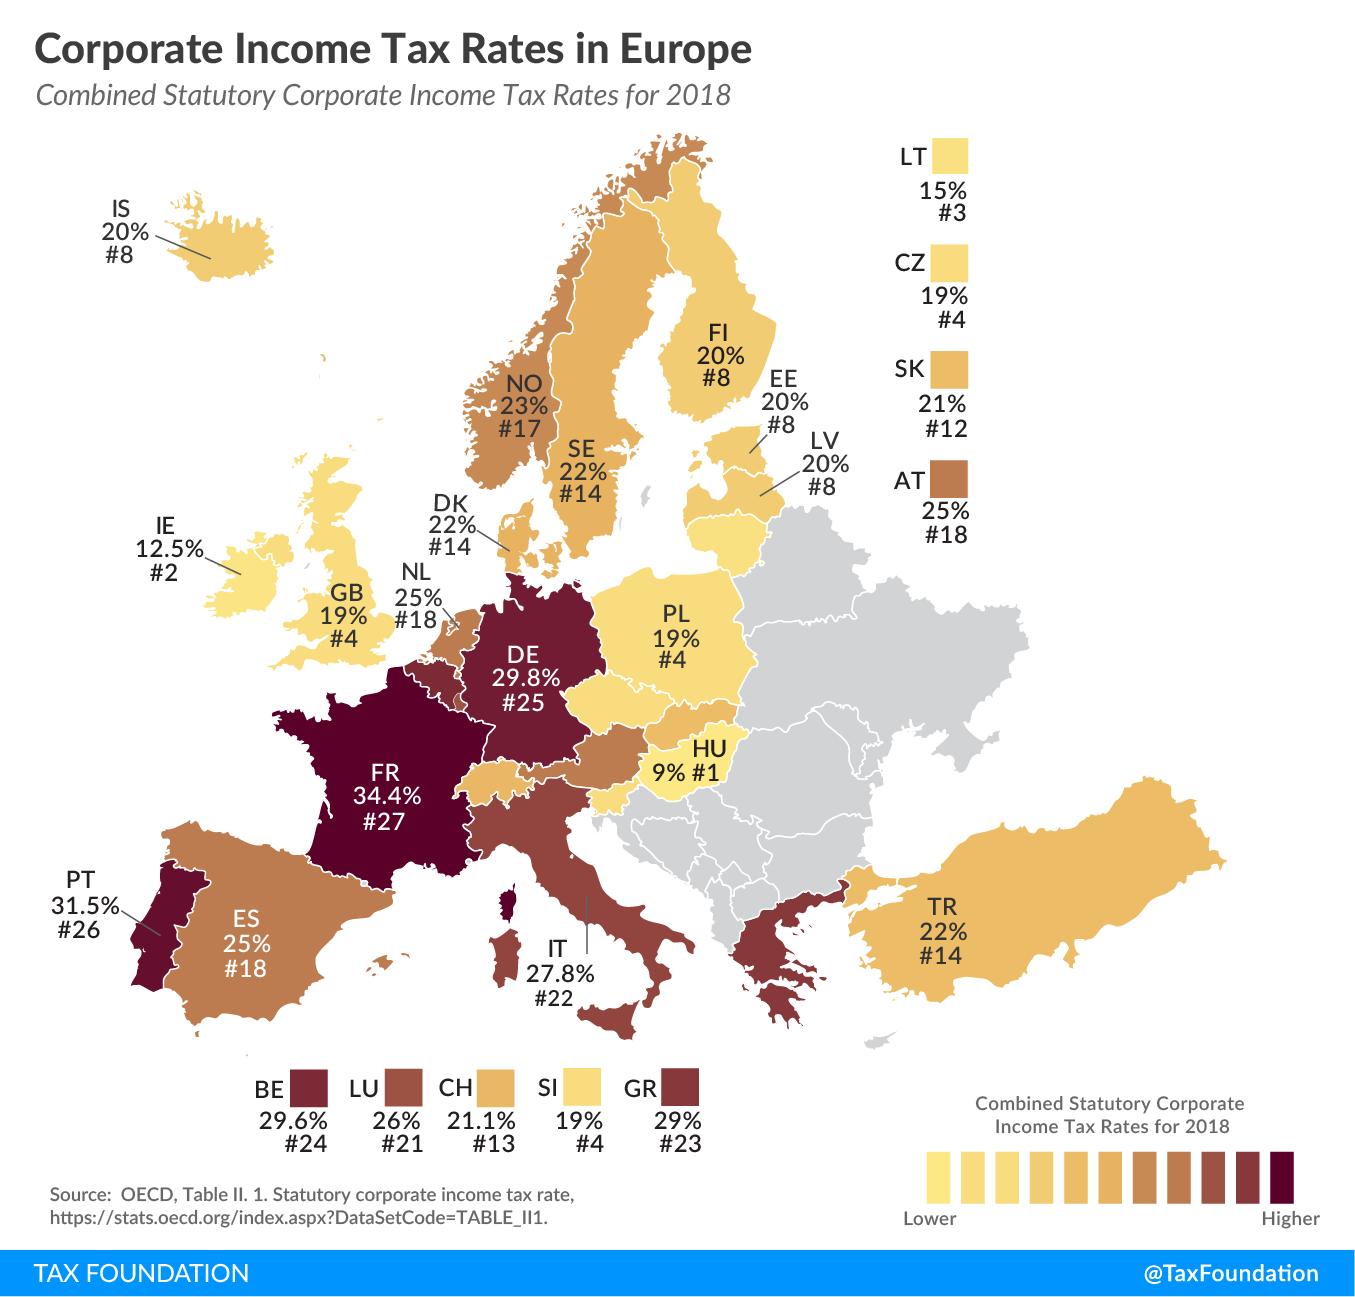 Corporate Income Tax Rates Europe, European Corporate Tax Rates, combined statutory corporate income tax rates Europe 2018